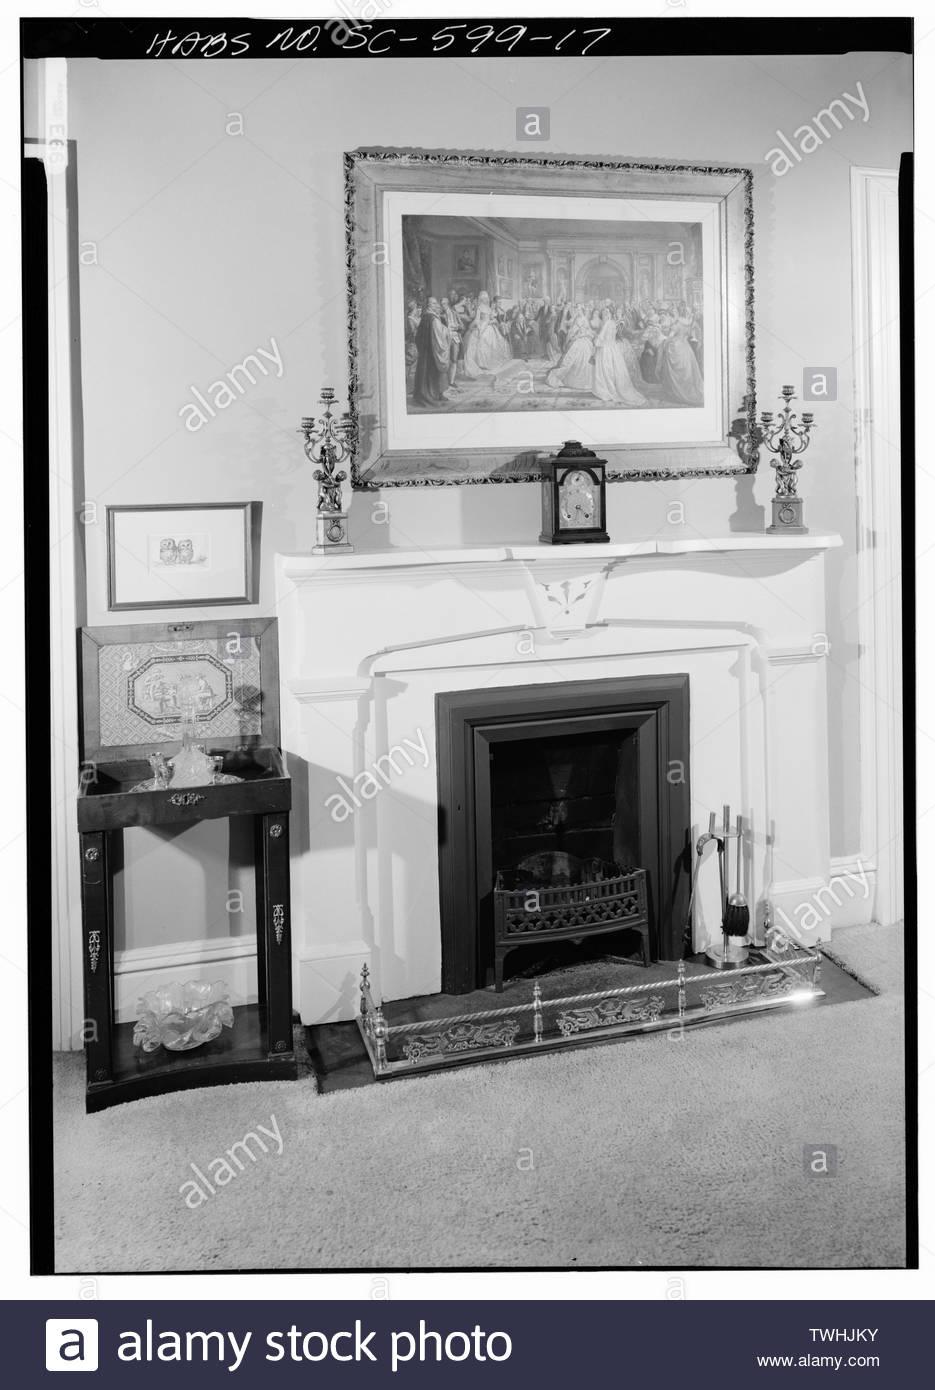 second floor northwest room east wall fireplace mantel lanneau norwood house 417 belmont avenue greenville greenville sc lanneau ch norwood john w image